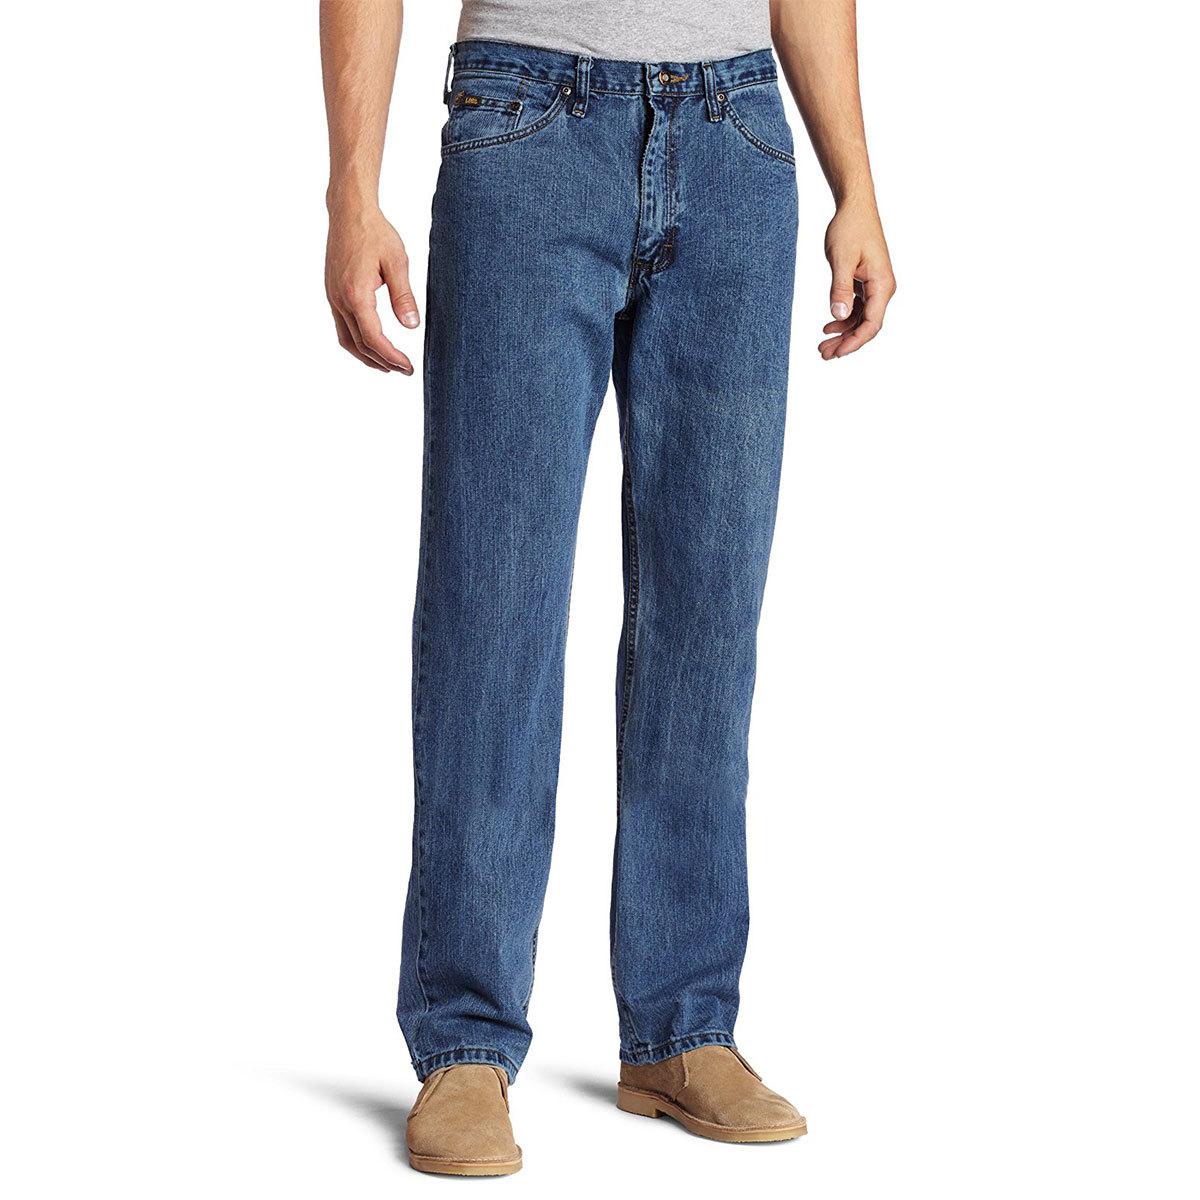 LEEA Premium Select Regular Straight Leg Jeans - Blue, 33/32